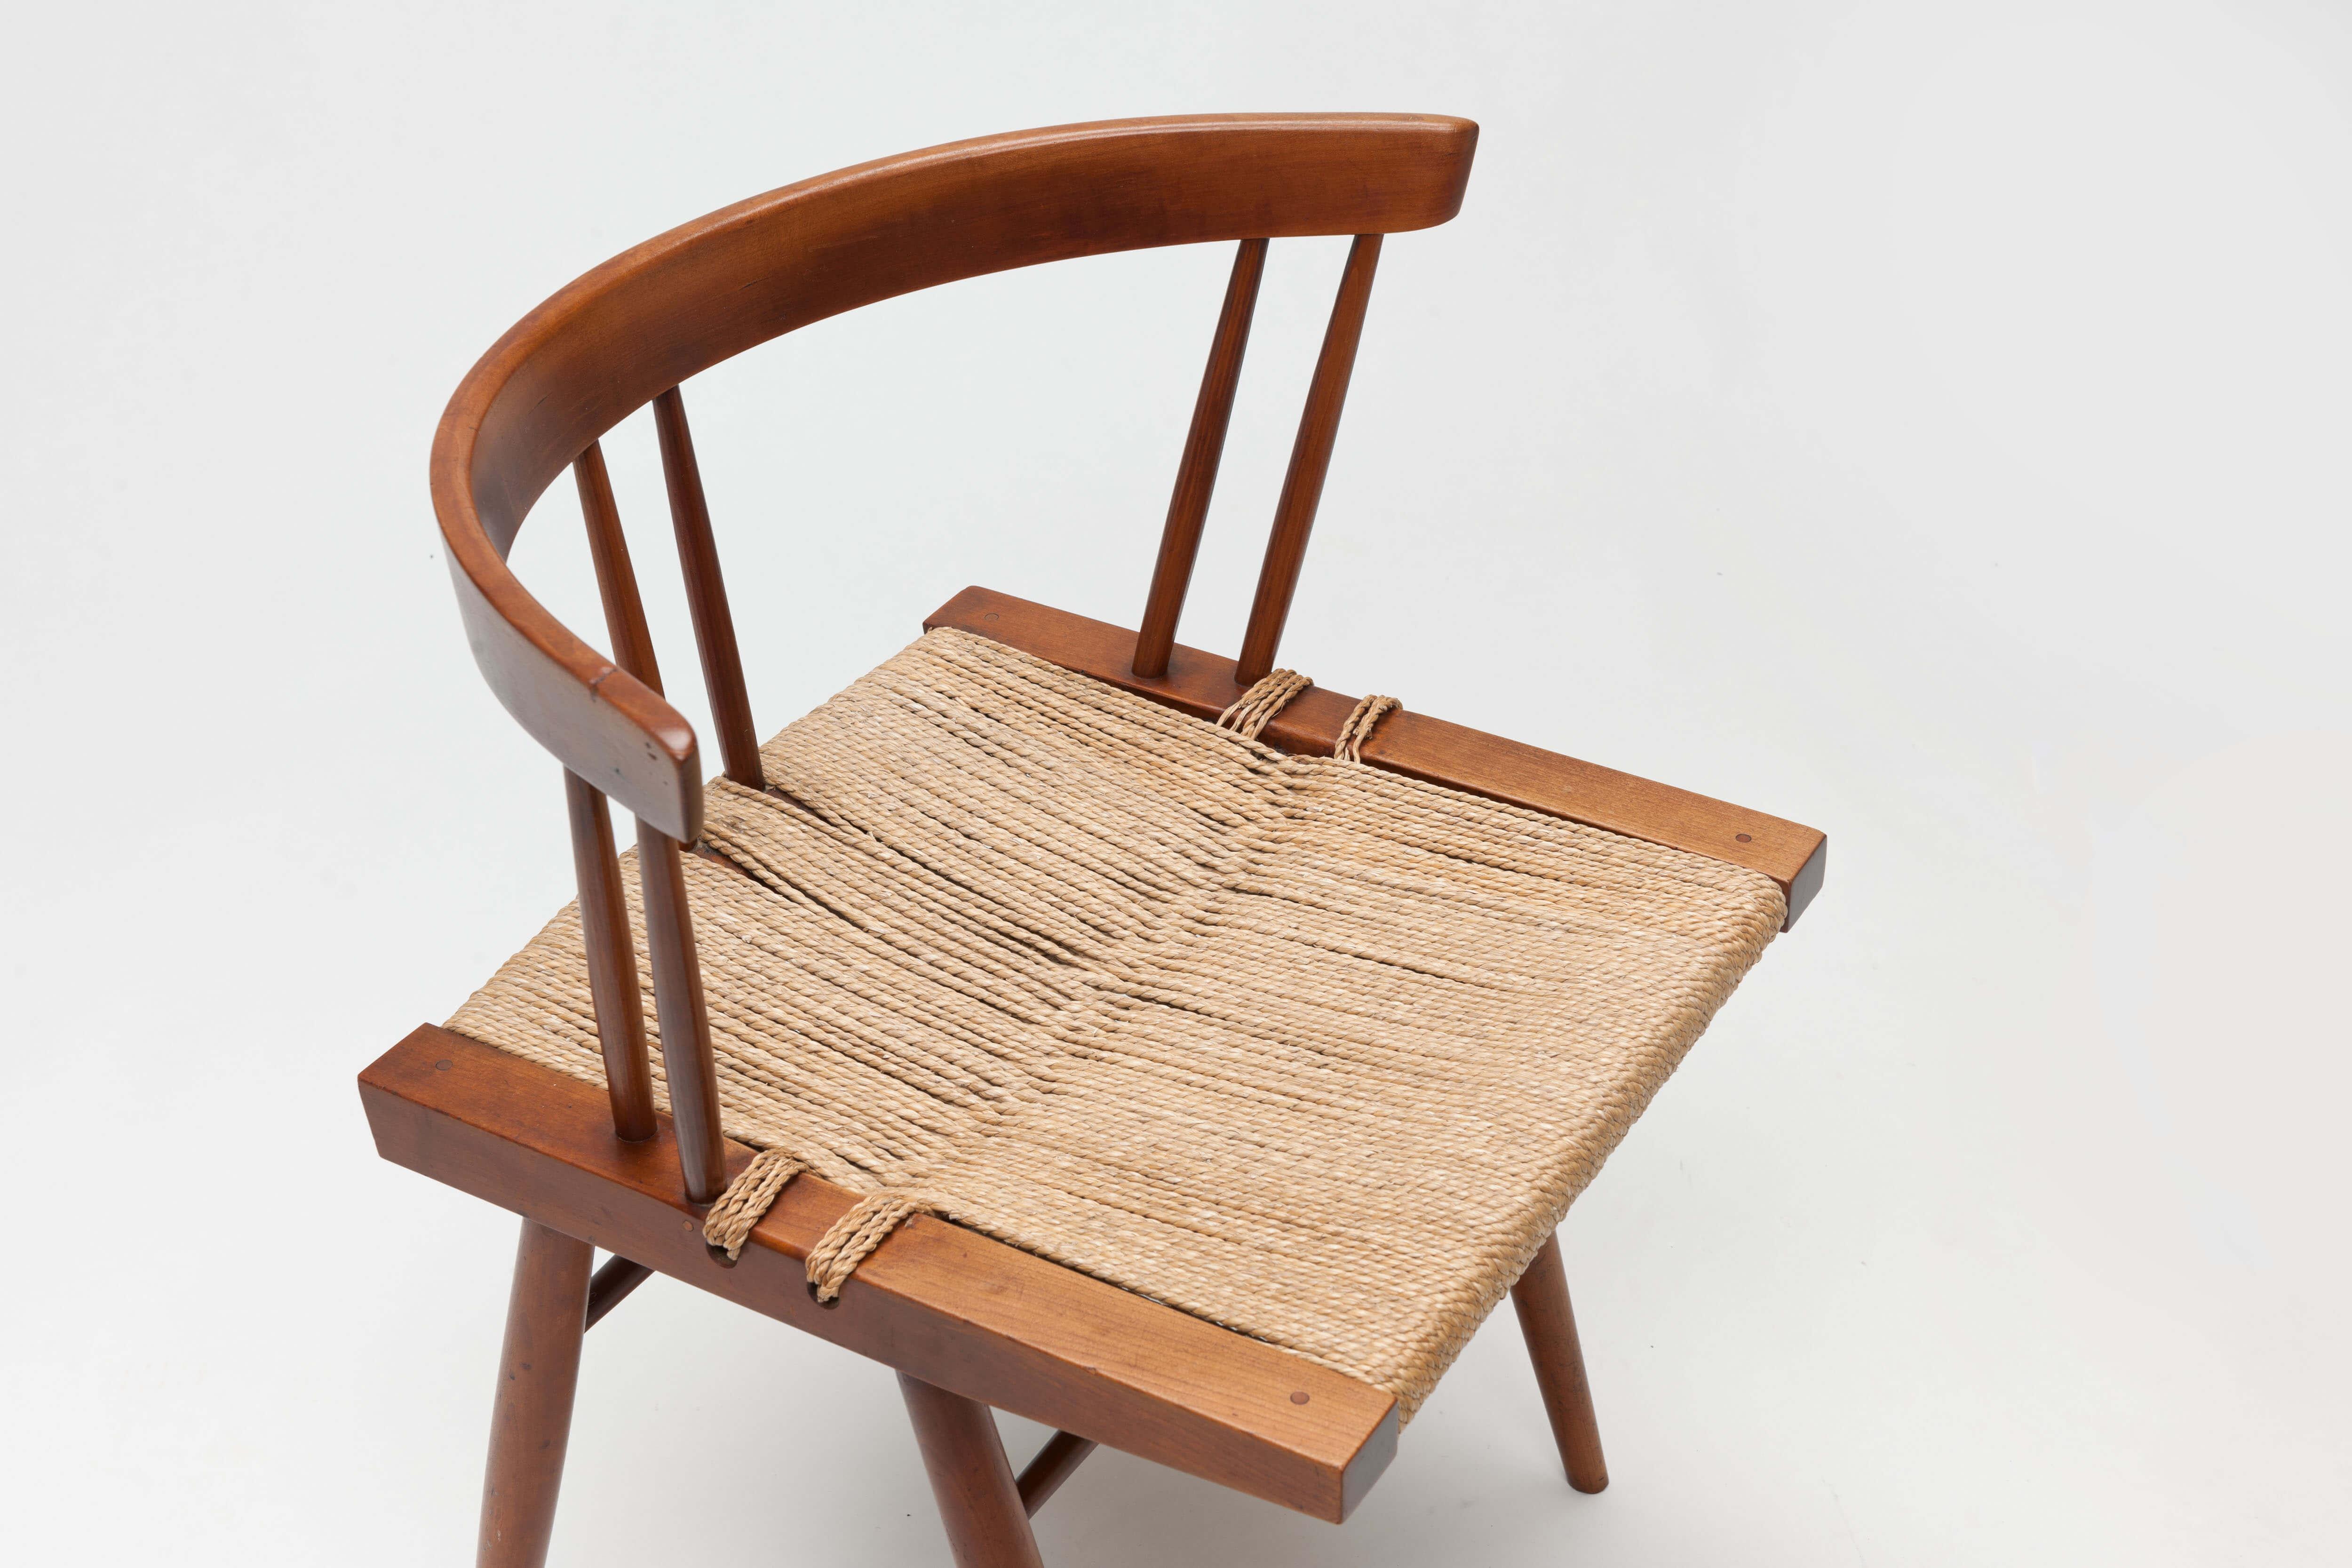 Vintage Grass Chair